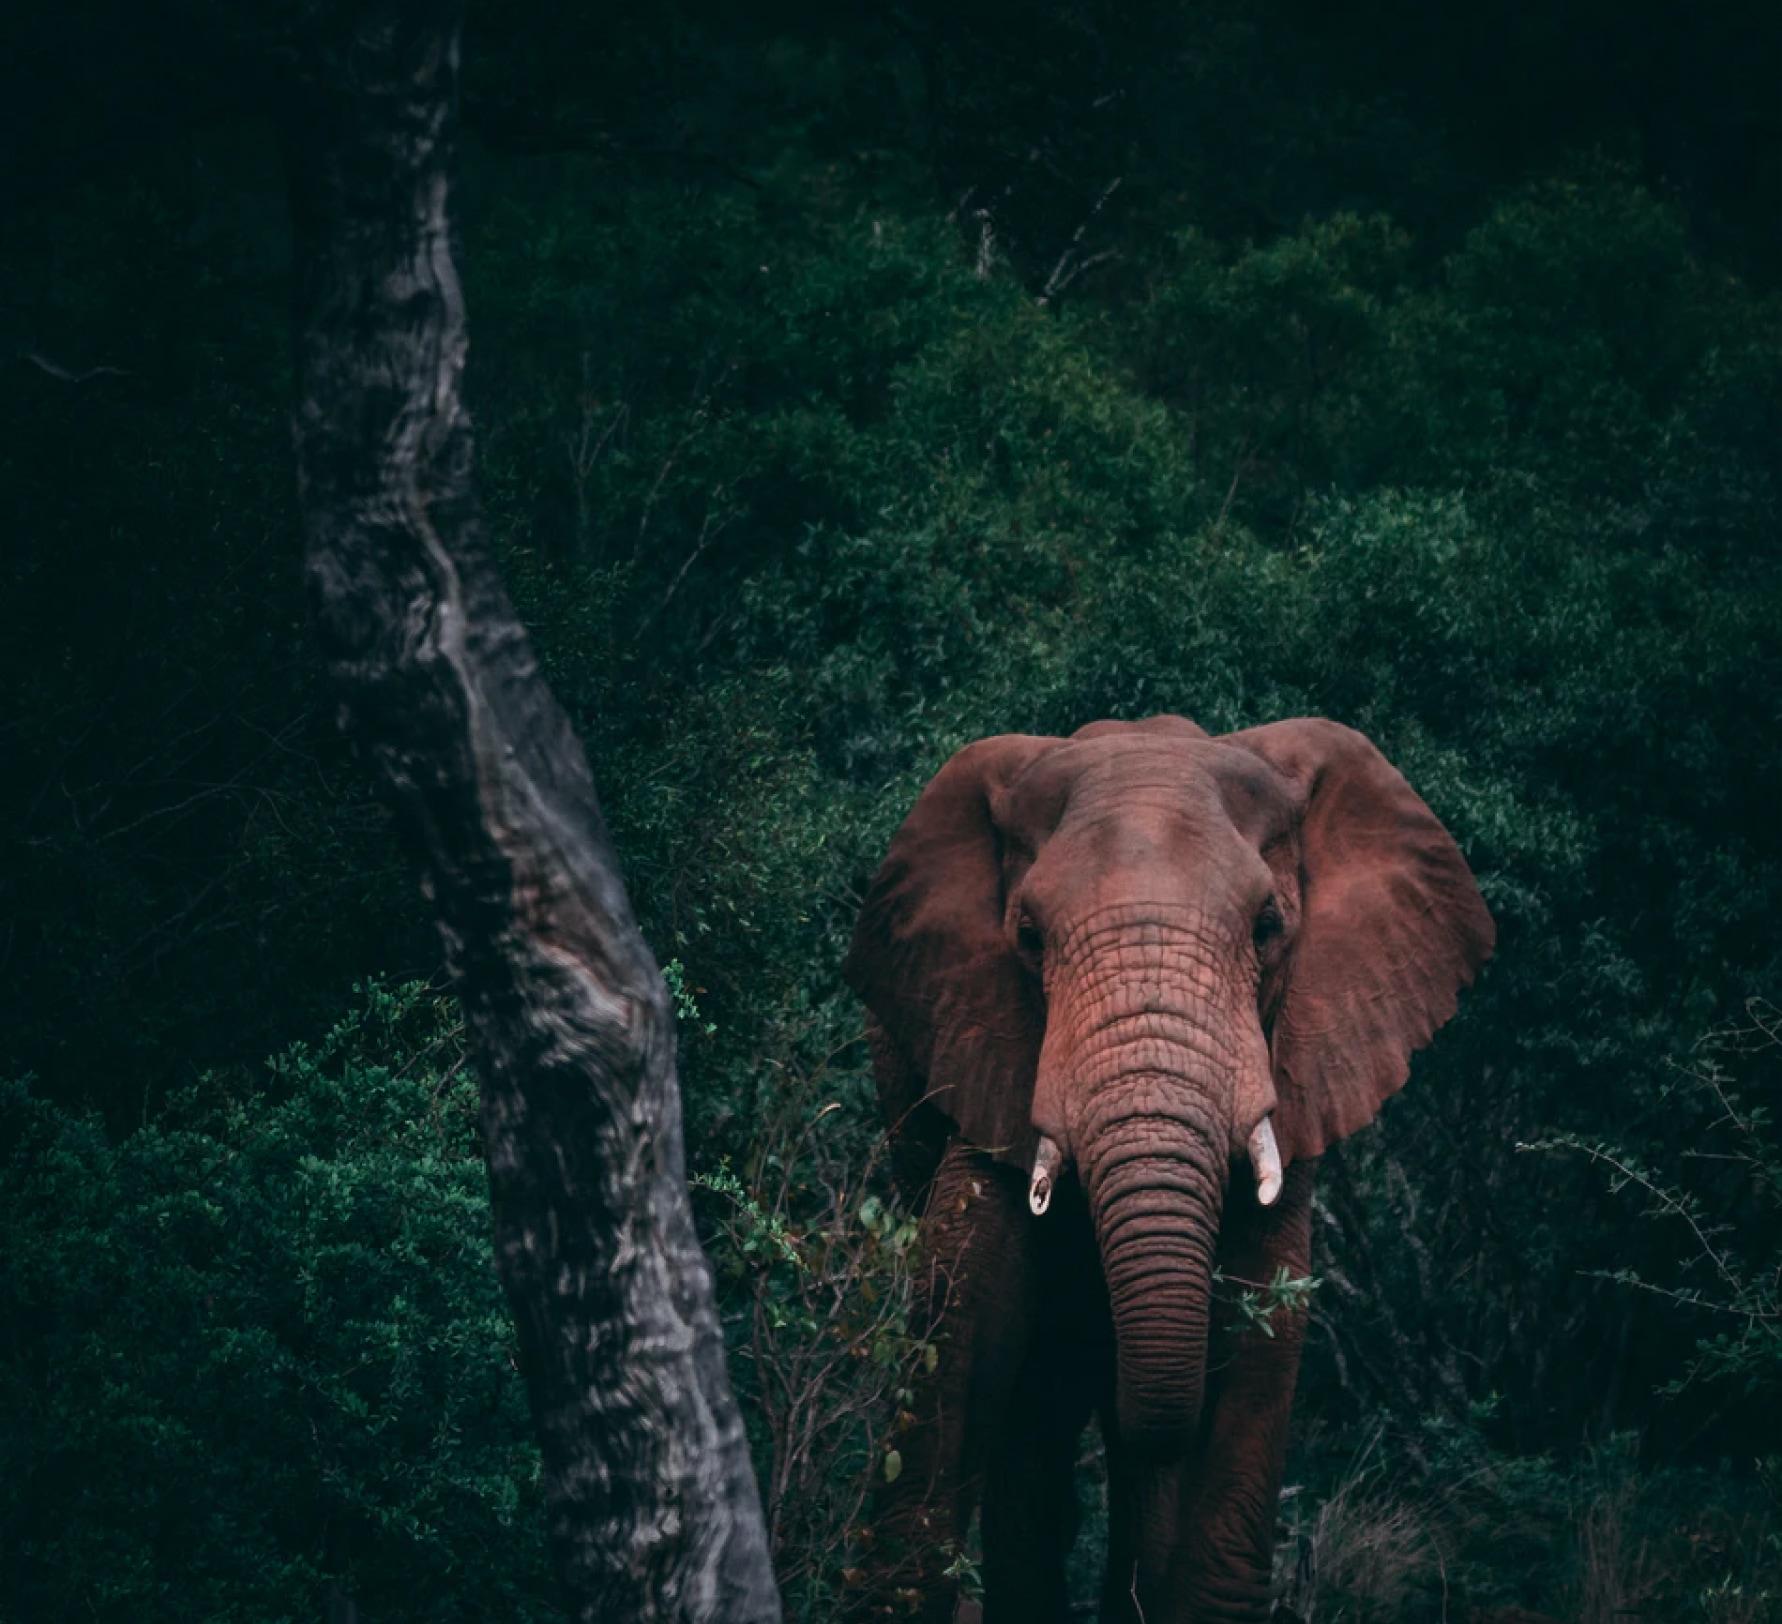 Elephant in a lush jungle